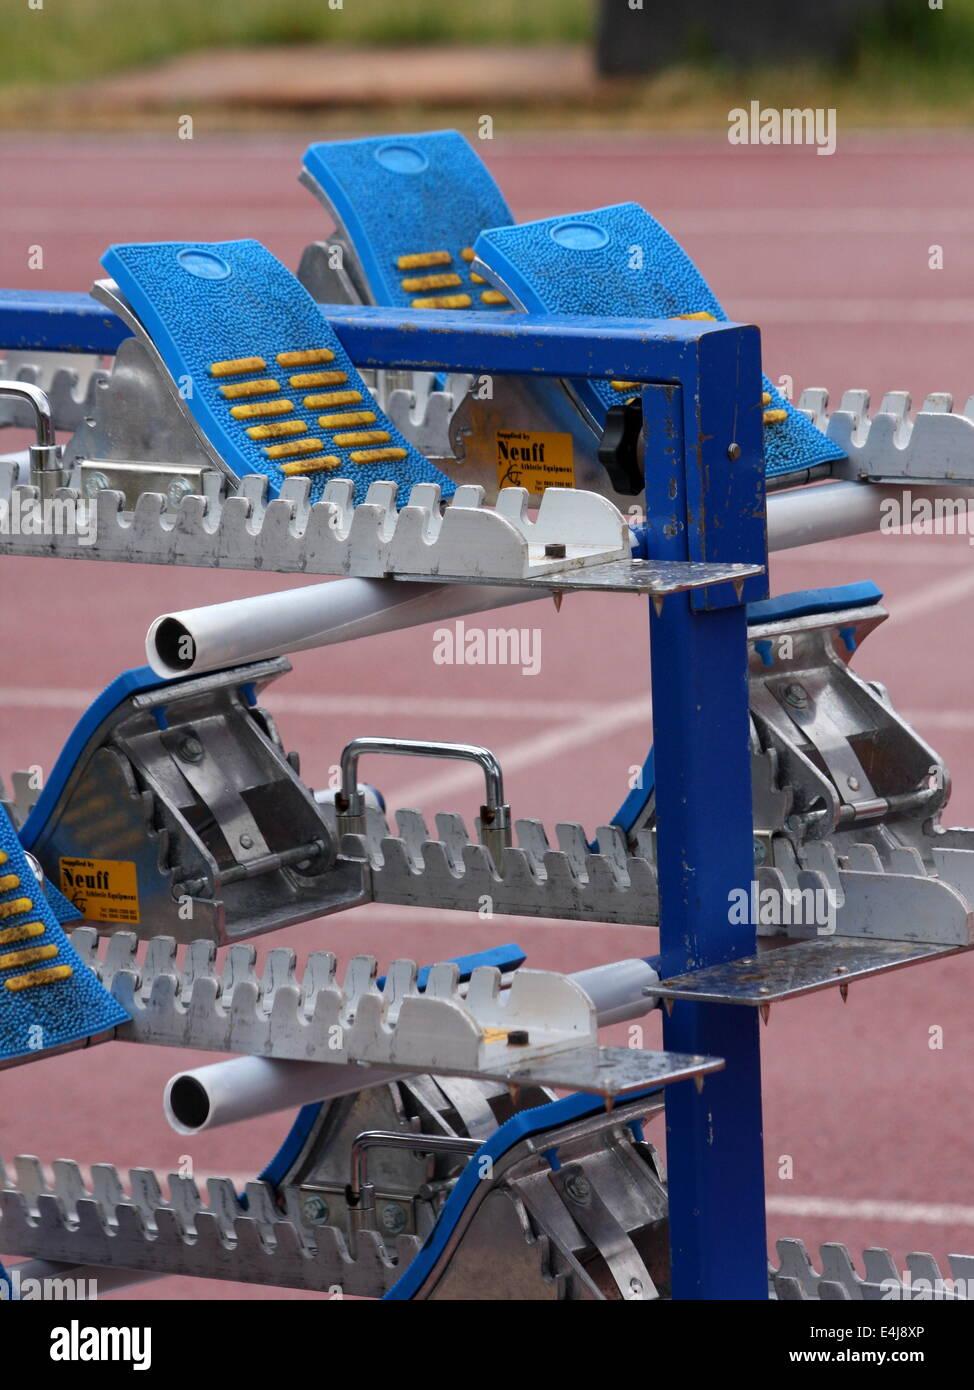 Starting blocks on stand - Stock Image